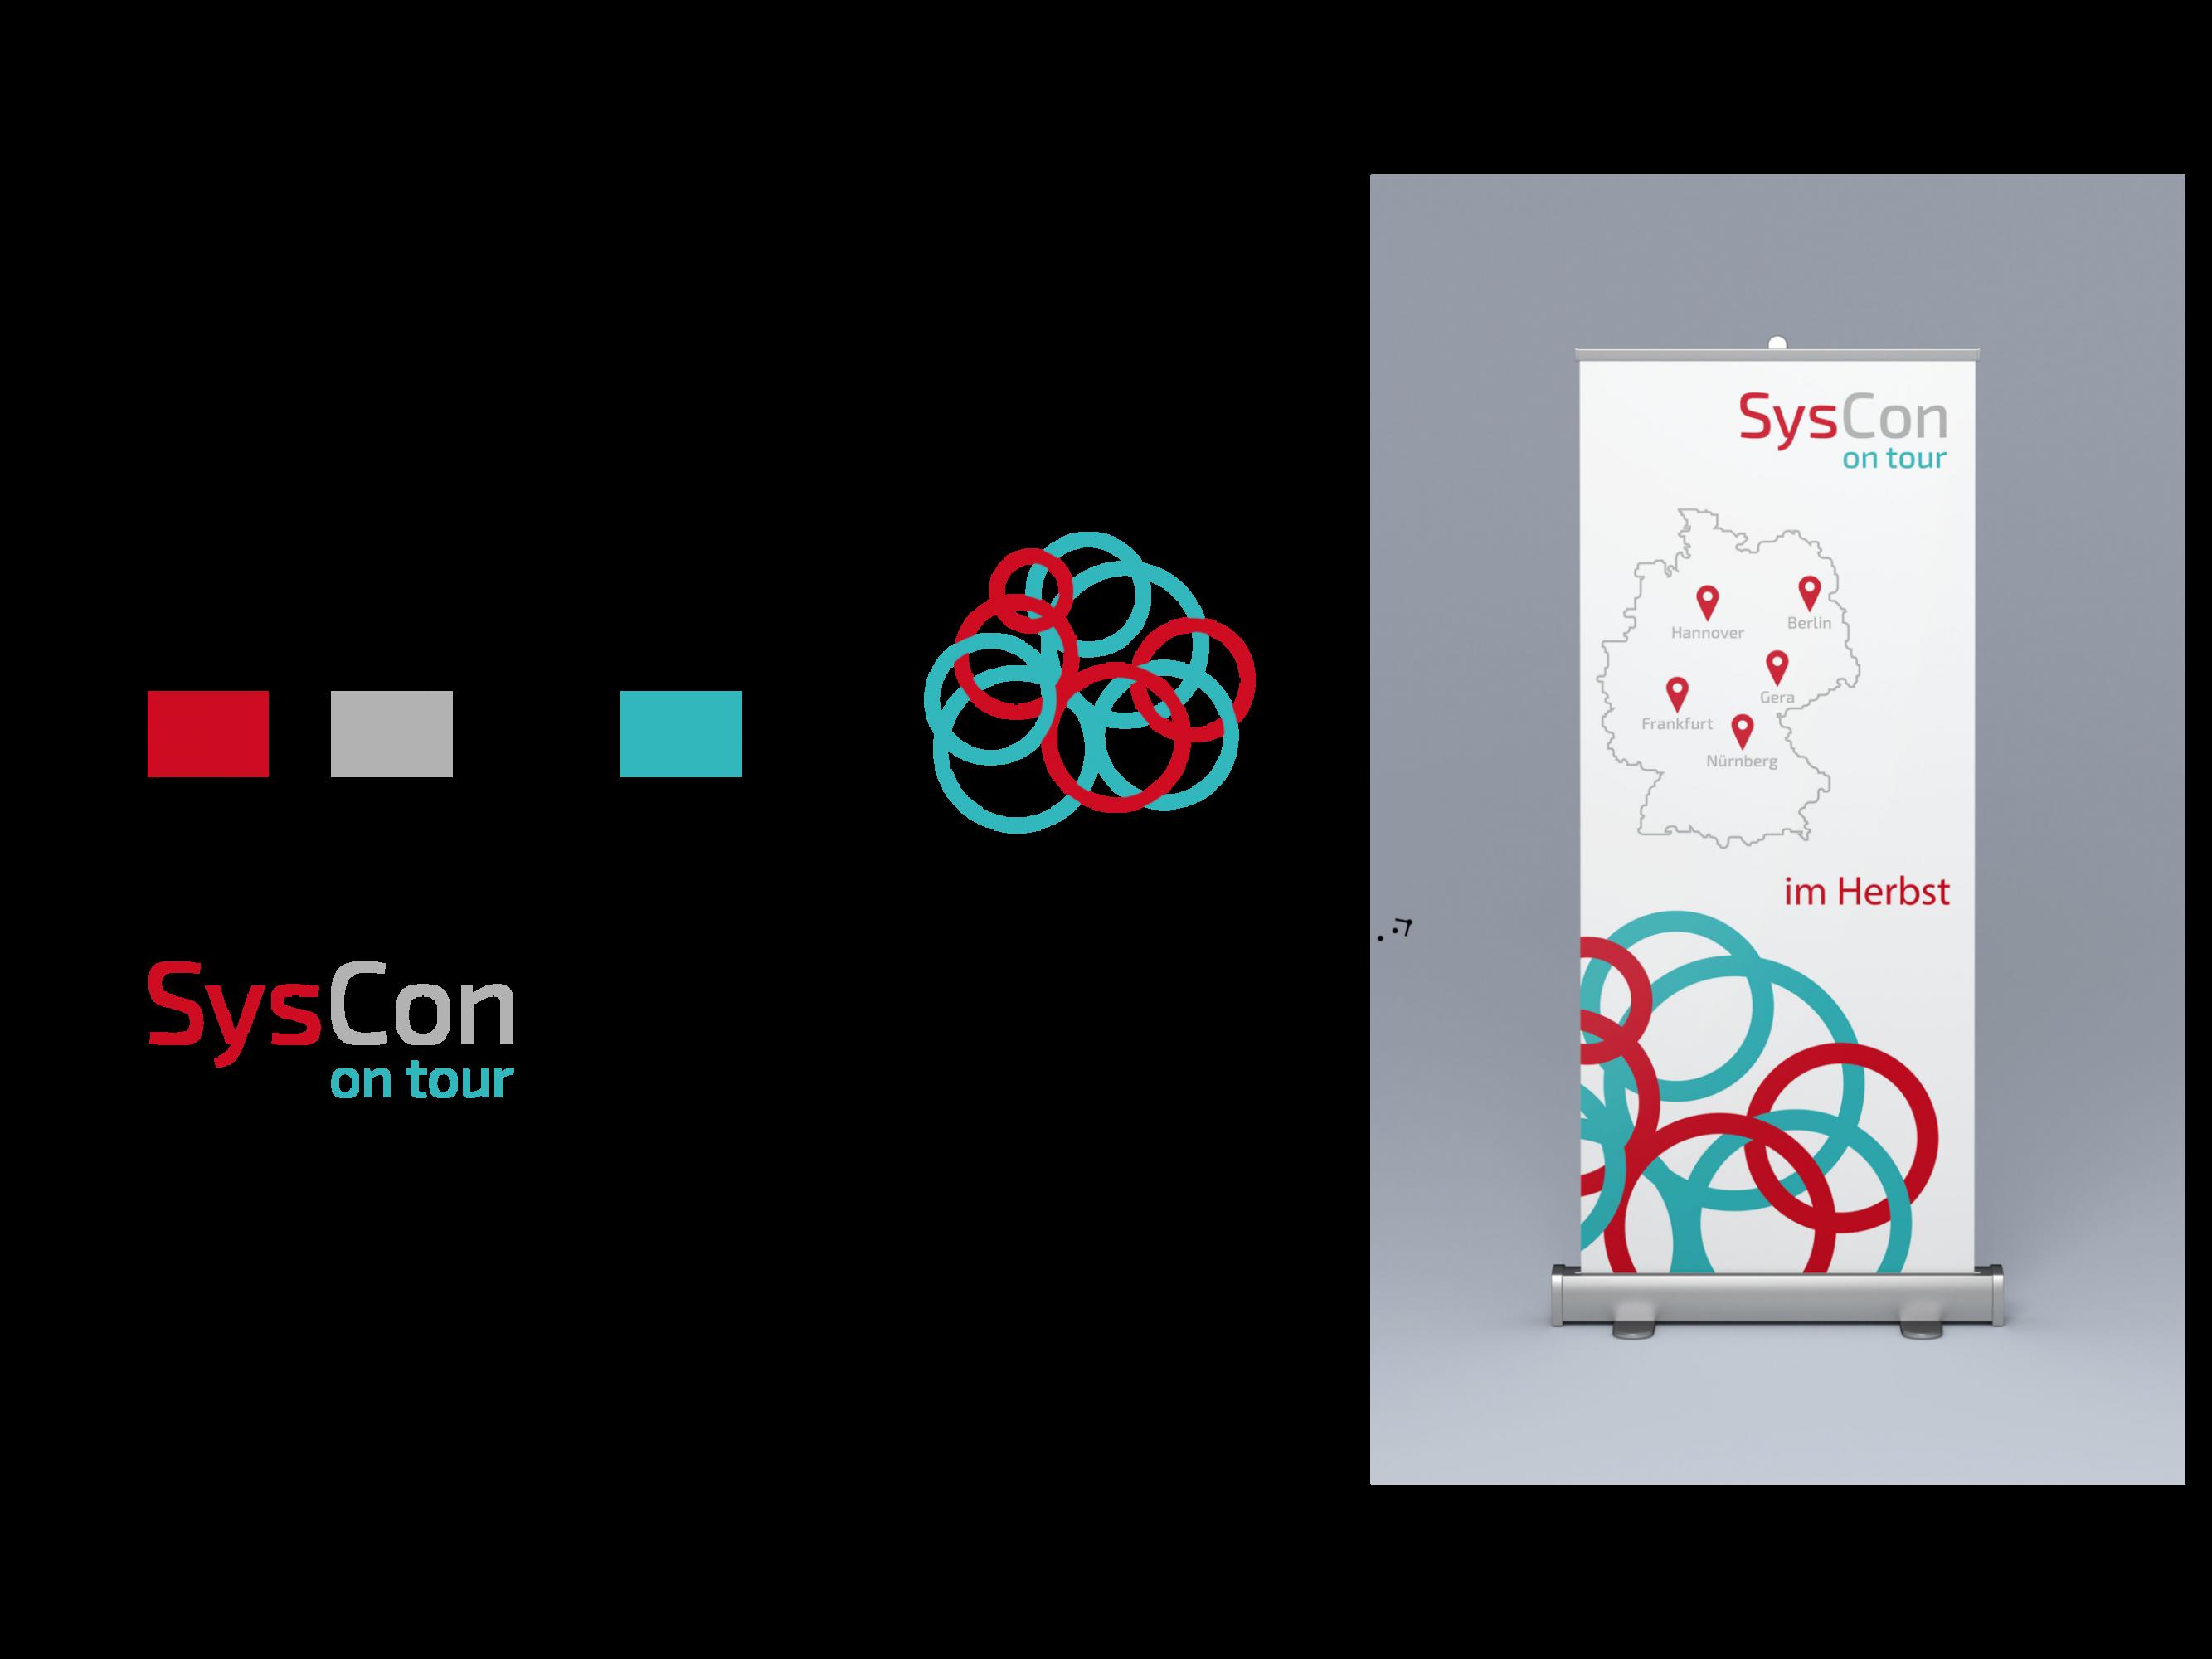 ConferenceBranding-SysCon_Event-Gestaltung-02